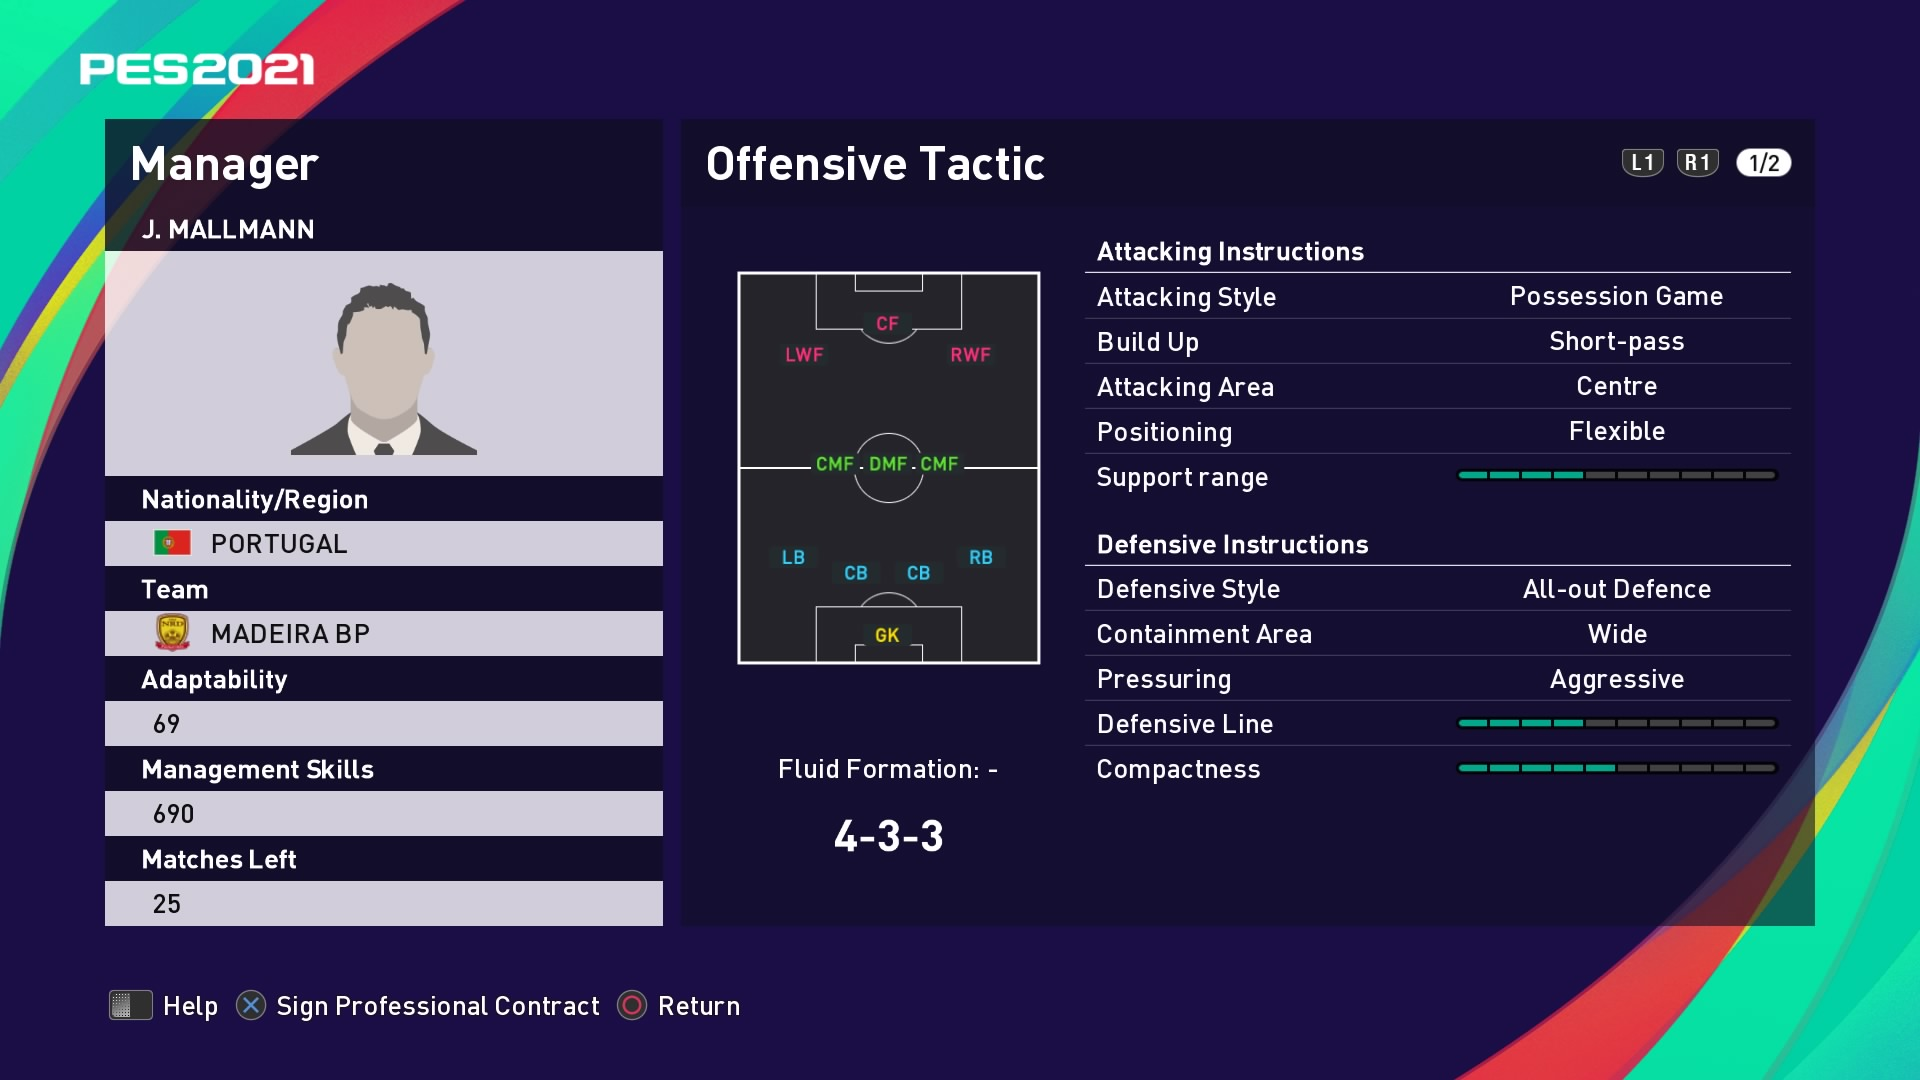 J. Mallmann (Luís Freire) Offensive Tactic in PES 2021 myClub